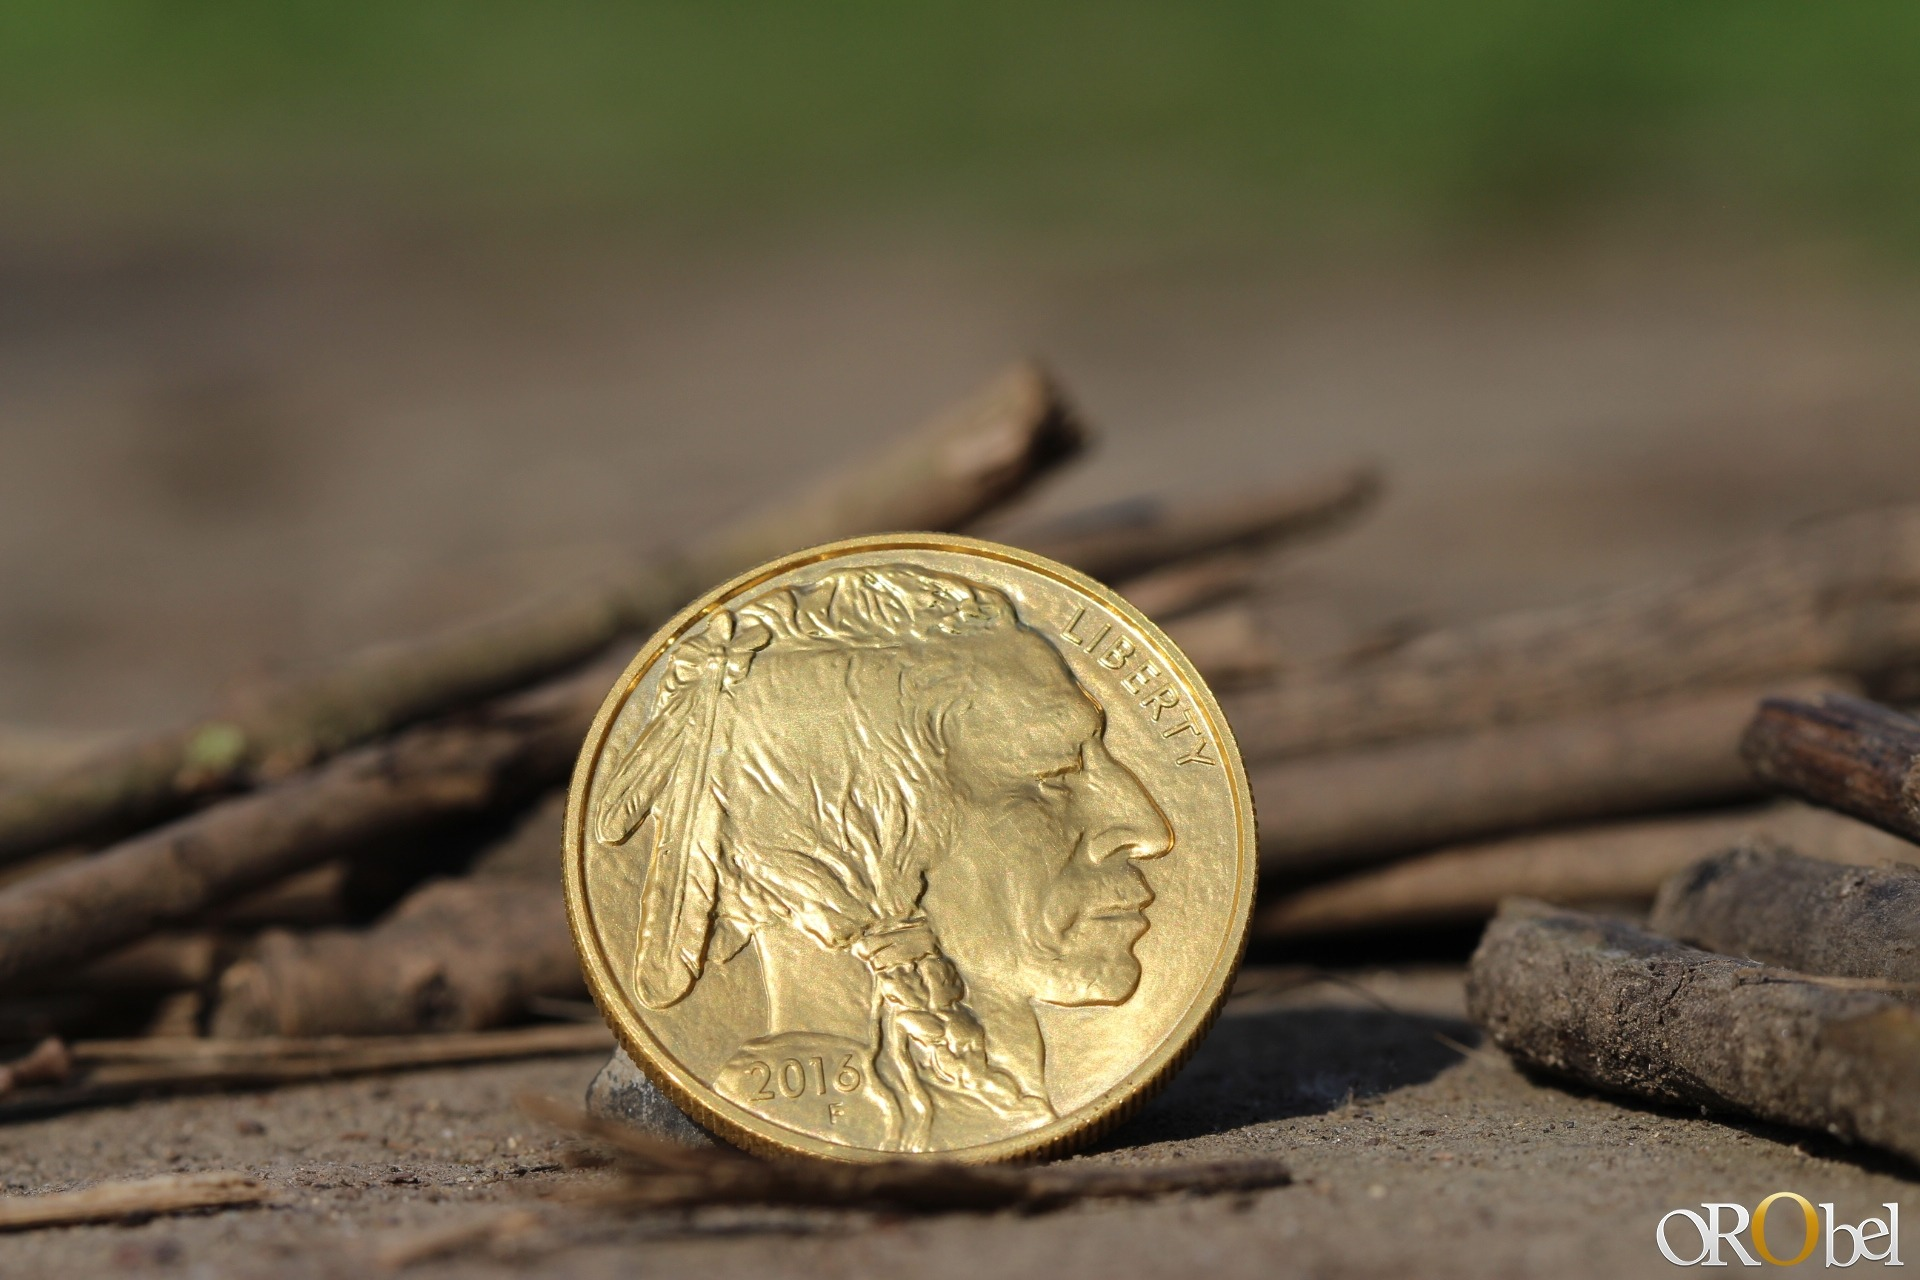 photo HD par orobel de la pice dor American Buffalo gold 2